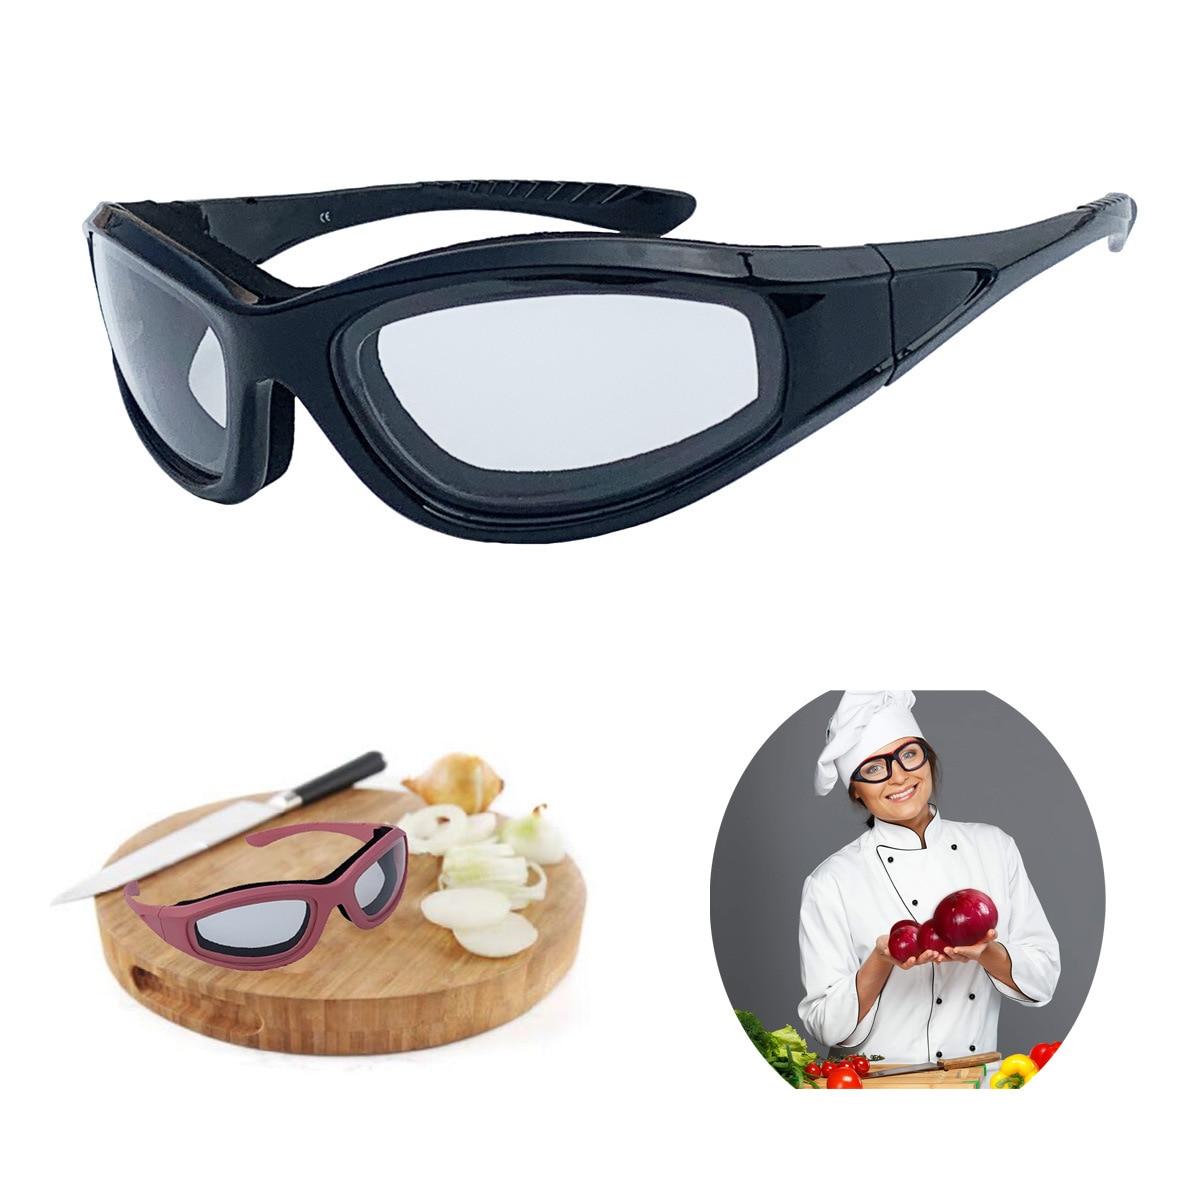 Cut onion garlic anti tears glasses closed onion goggles HD transparent